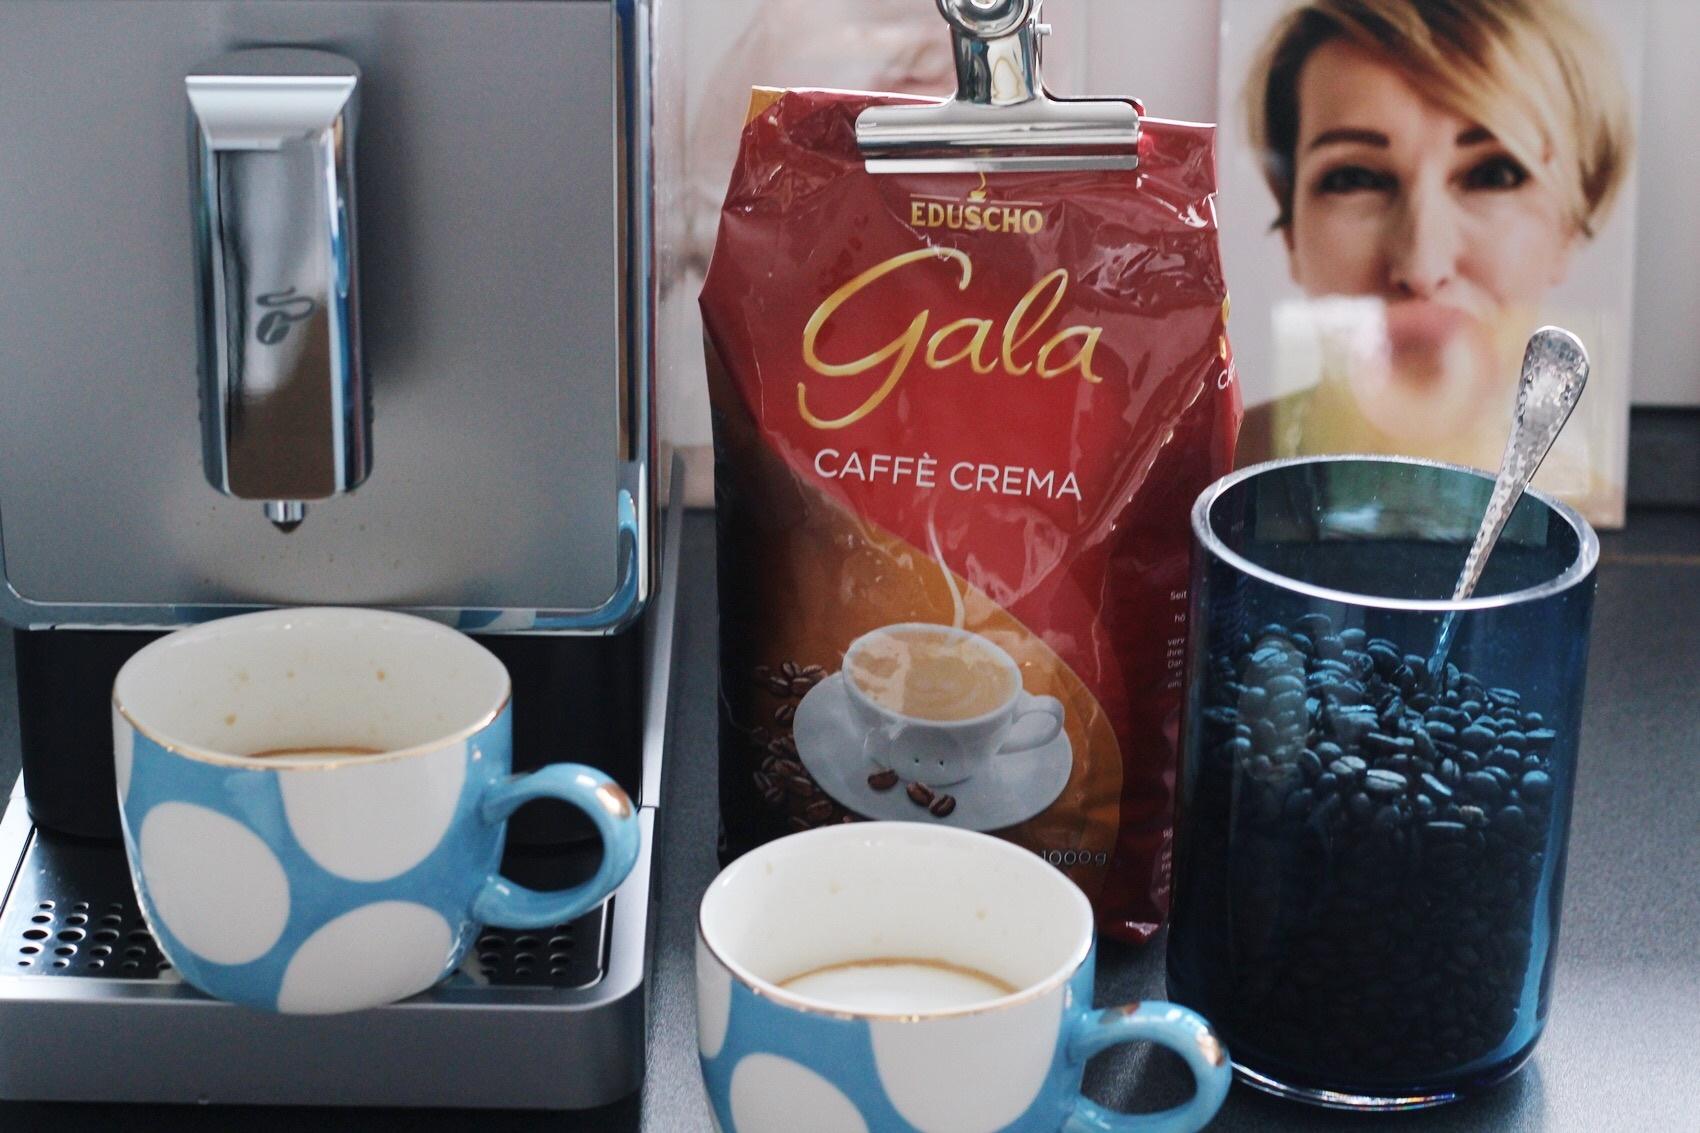 glamupyourlifestyle Kaffeevollautomat tchibo Gala eduscho Caffe Crema ue-50 blog ü40